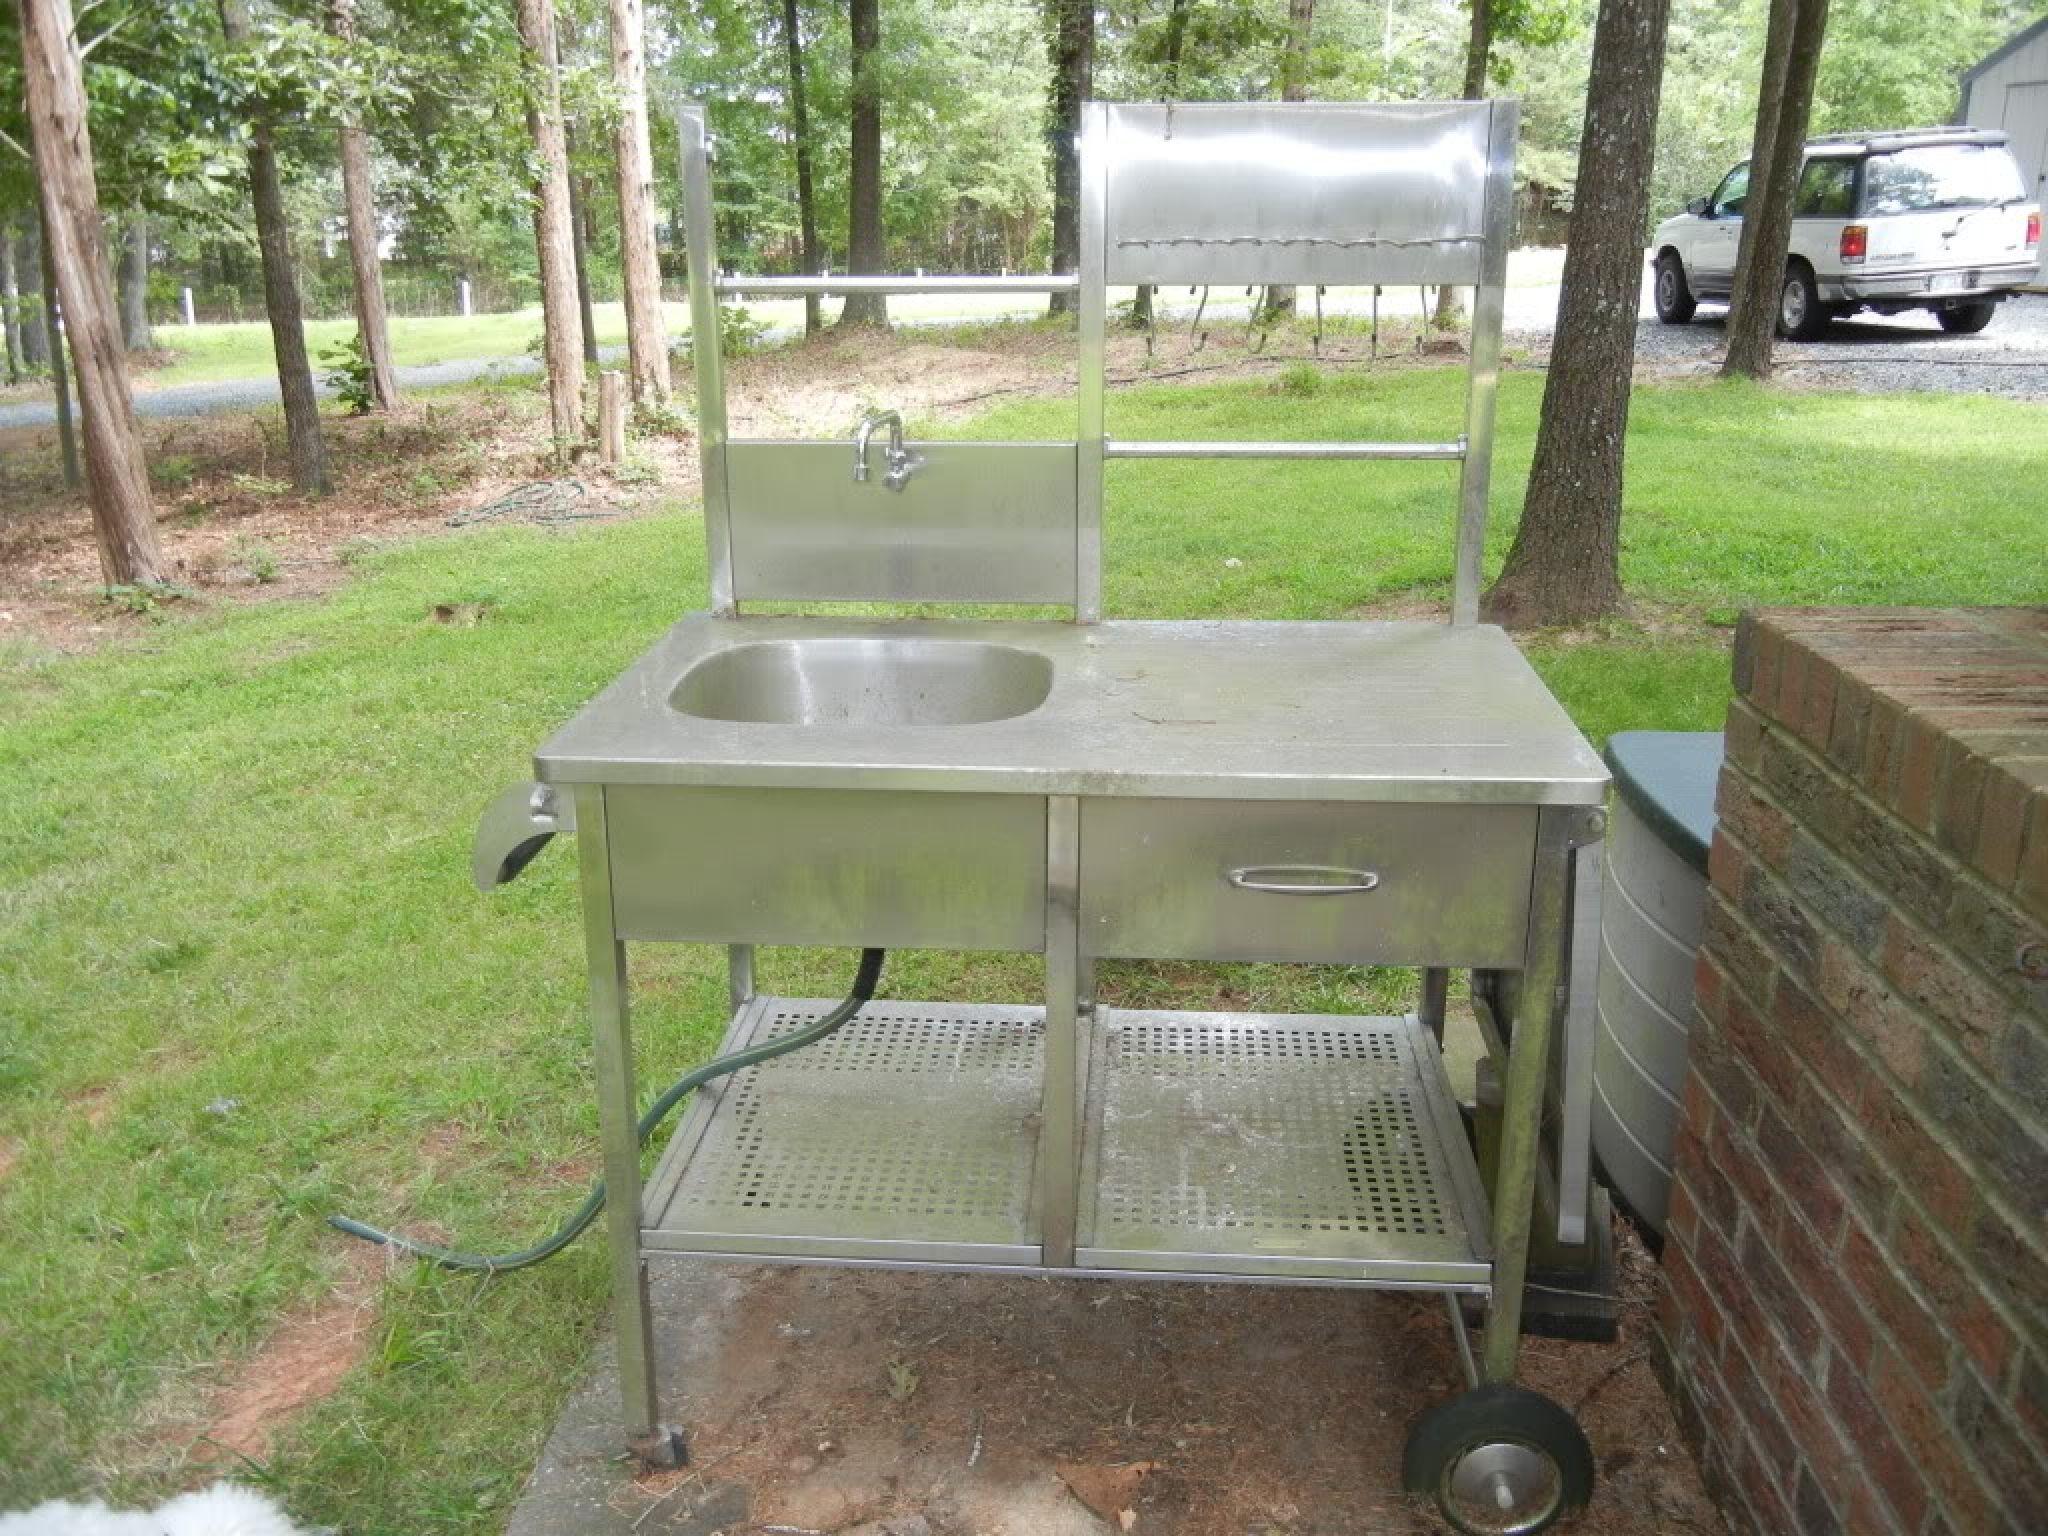 Members Mark Outdoor Kitchen Best Interior Paint Brands Check More At Outdoor Kitchen Sink Outdoor Sinks Kitchen Sink Design